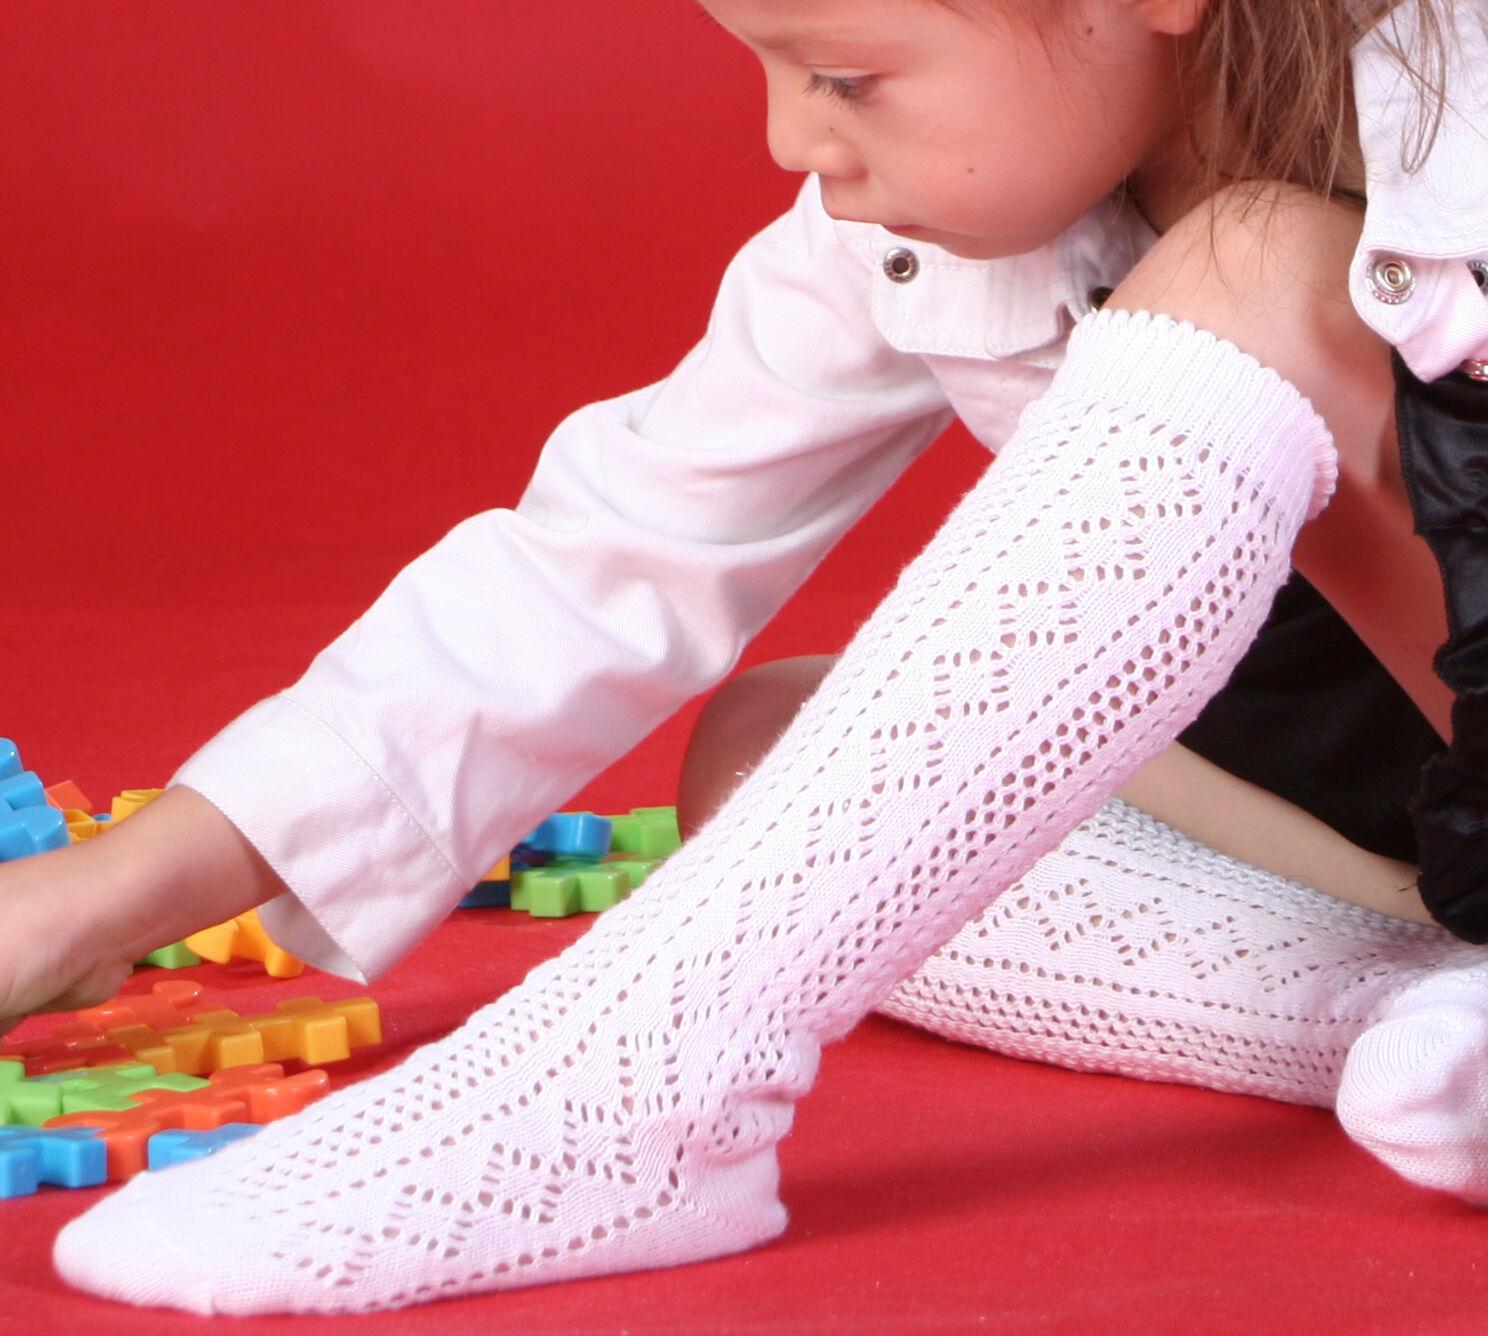 children photography calculator sock - HD1488×1336